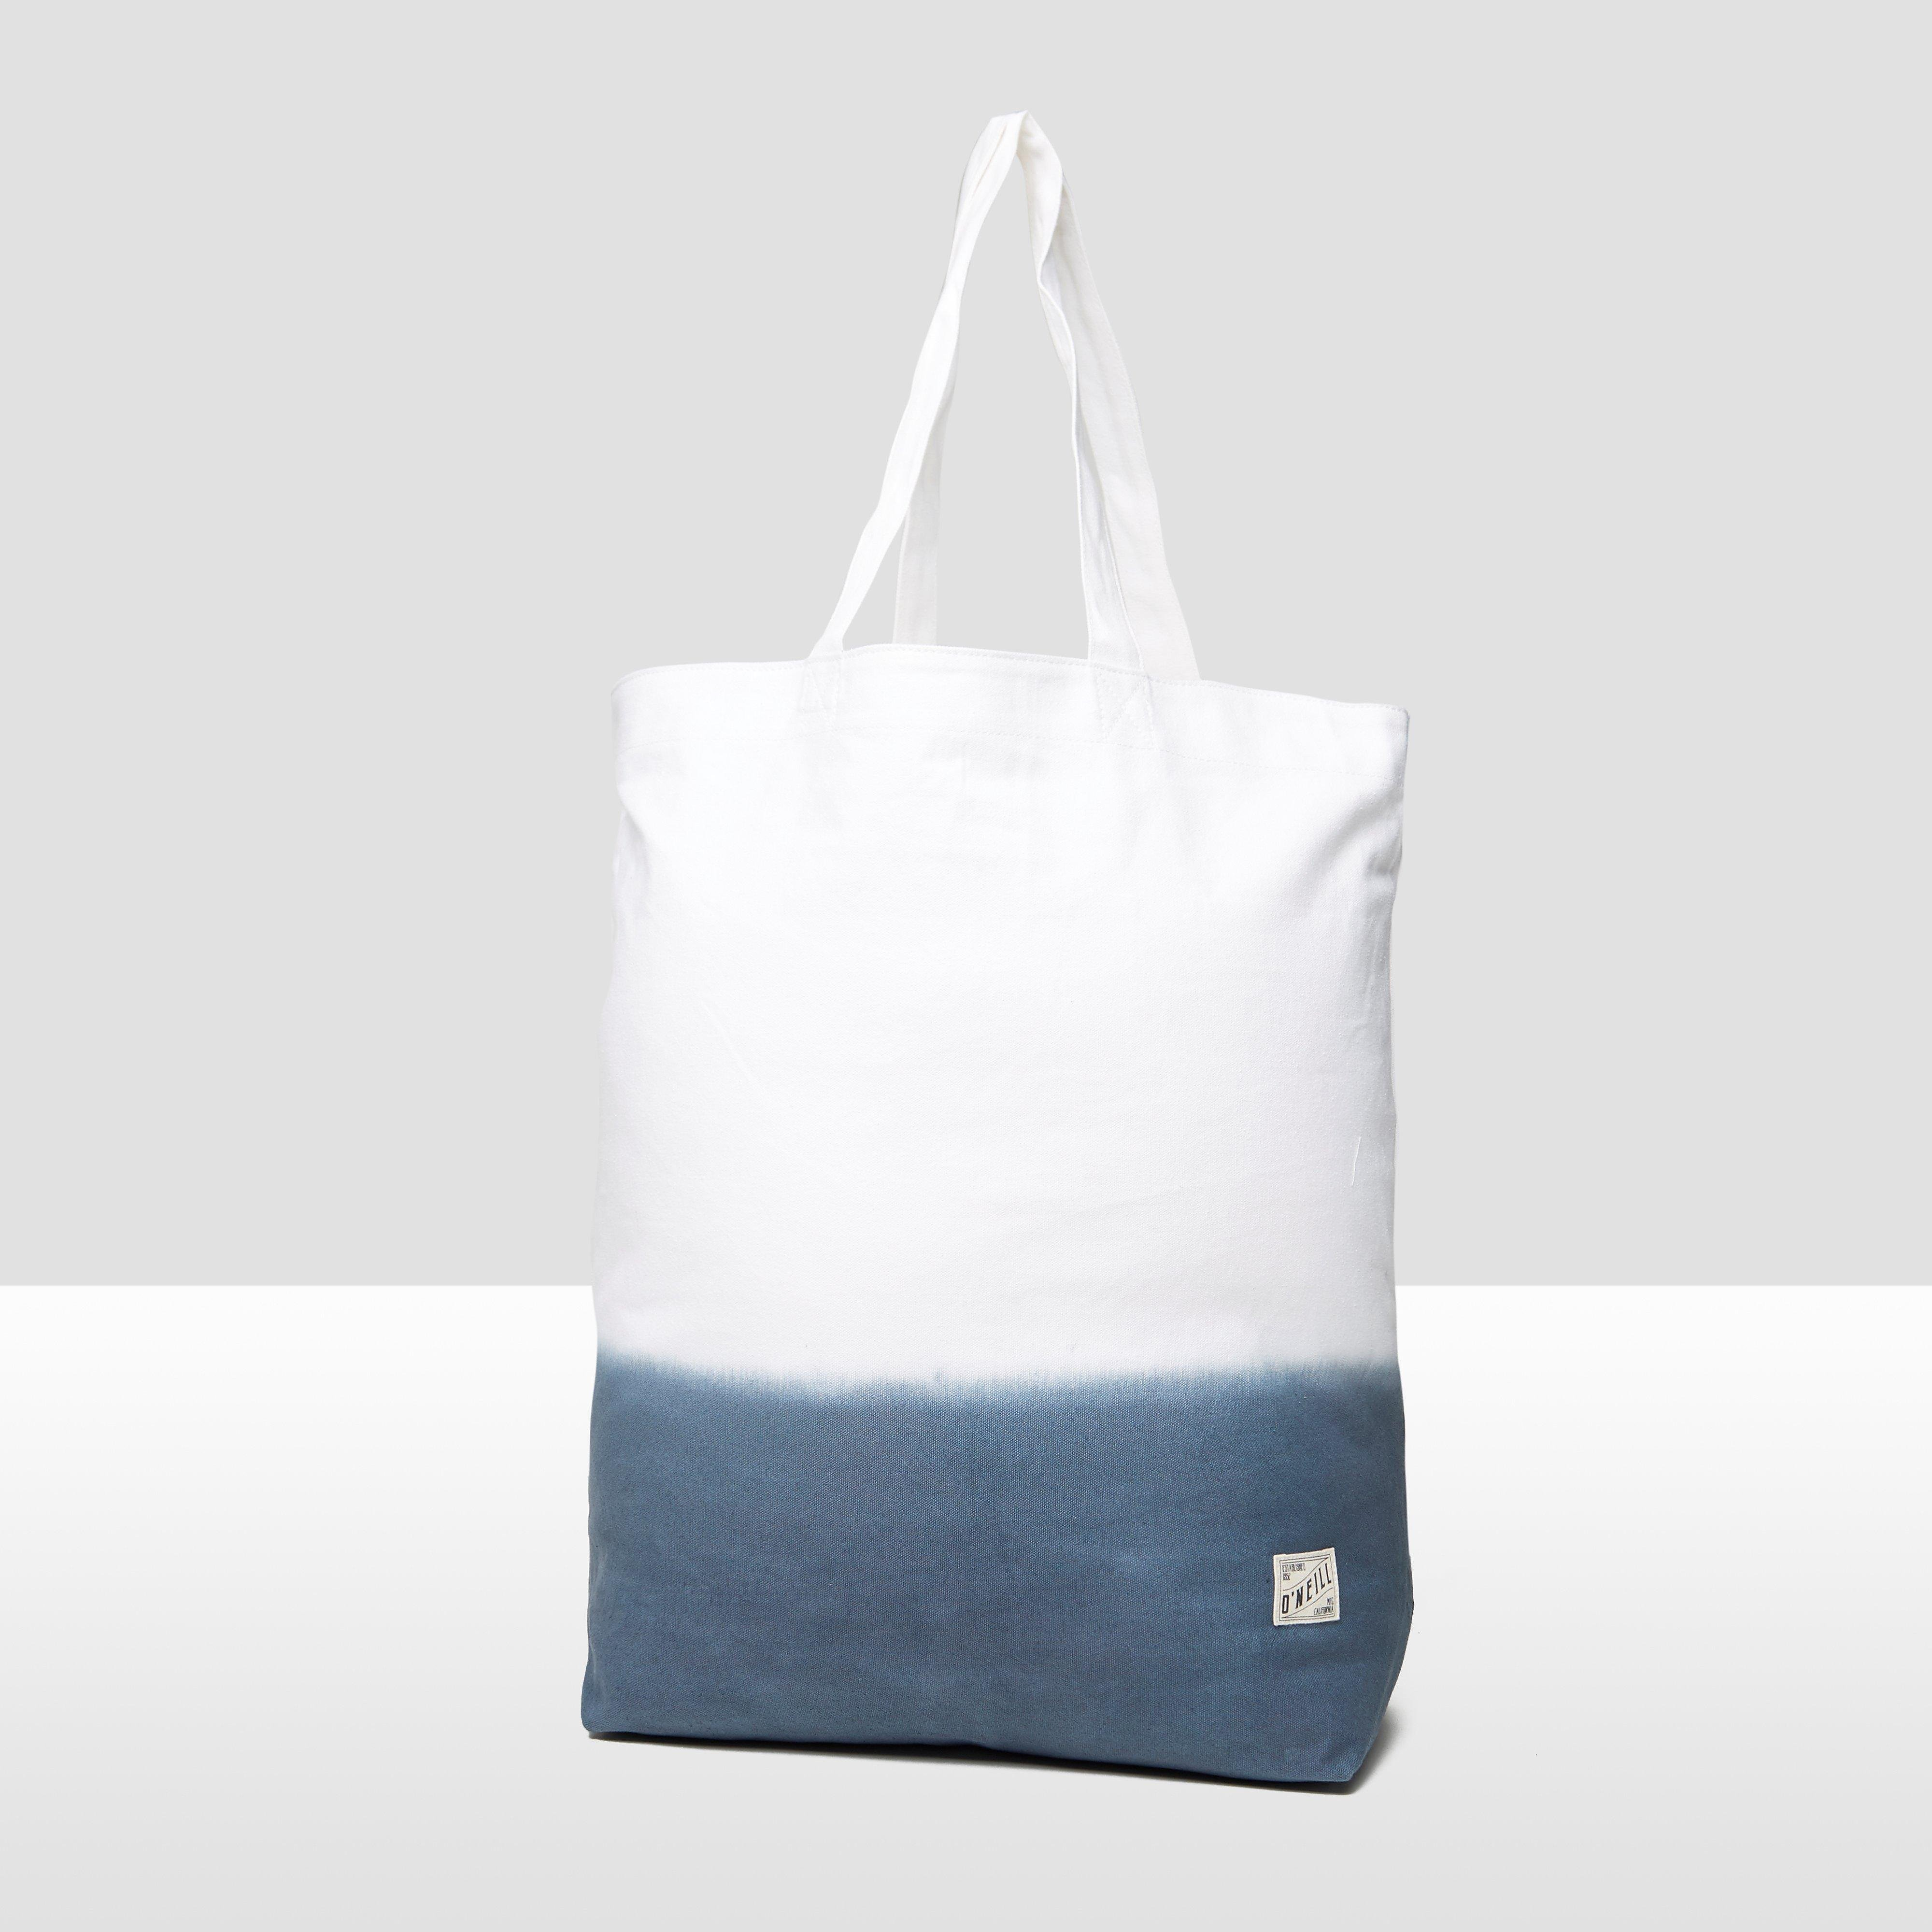 O'NEILL SUNRISE BEACH BAG